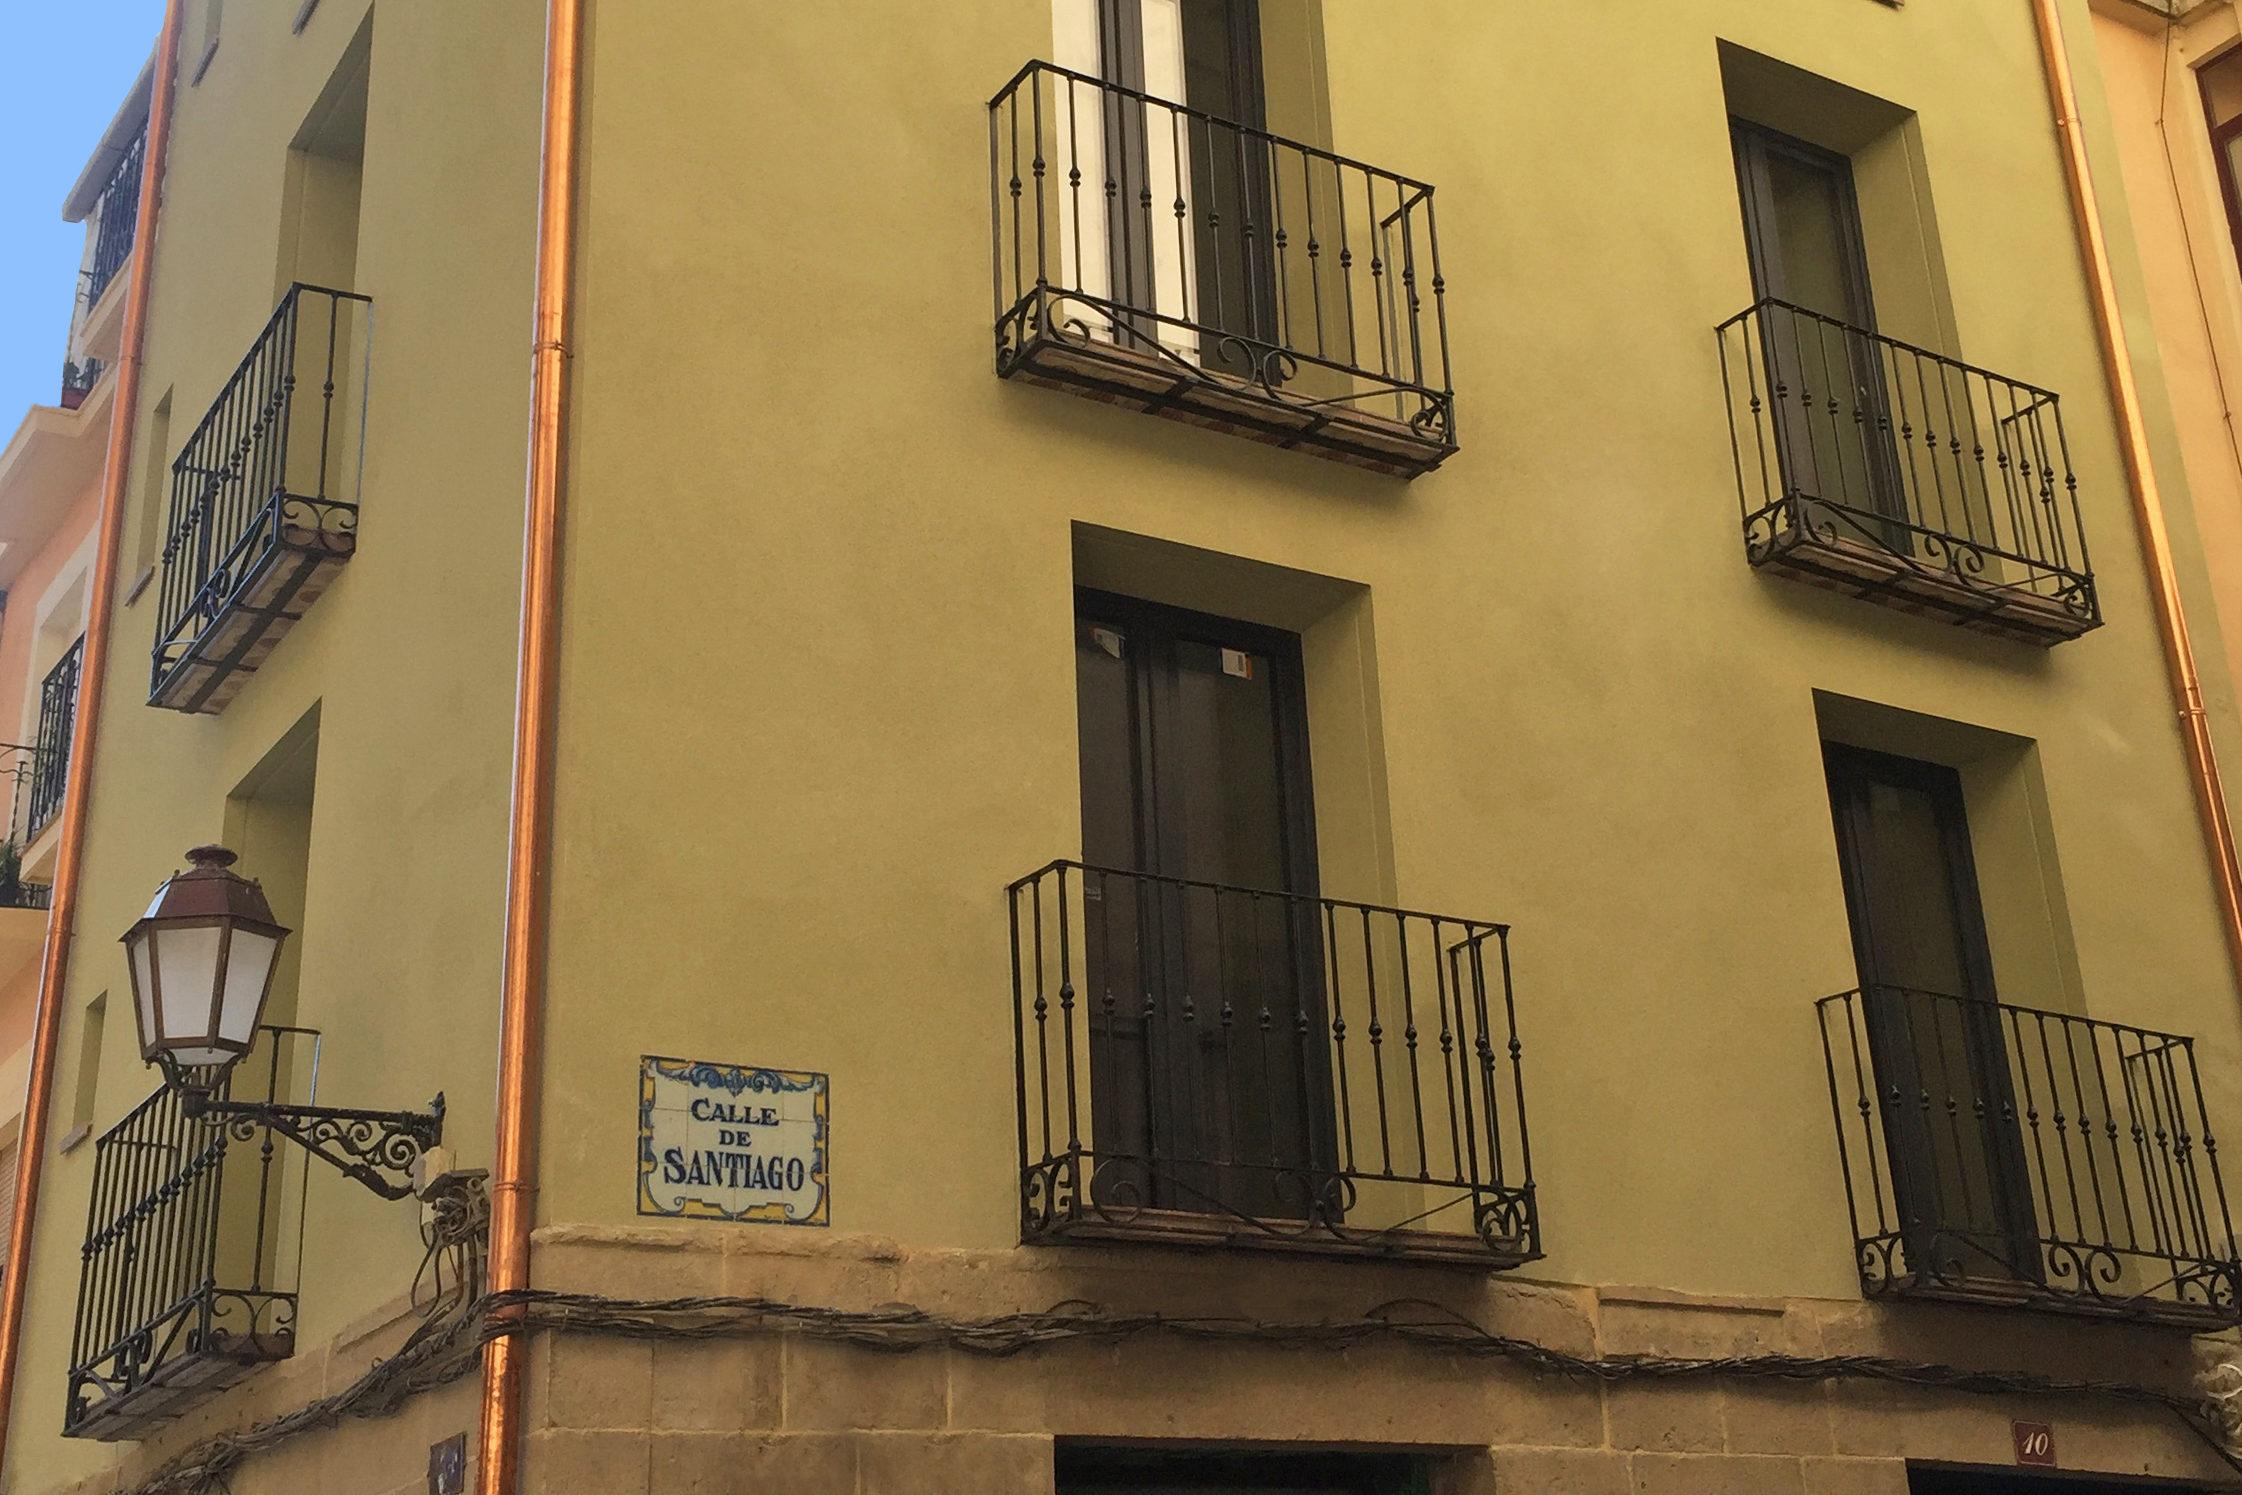 ventanas passive house, VENTANAS PASSIVE HOUSE